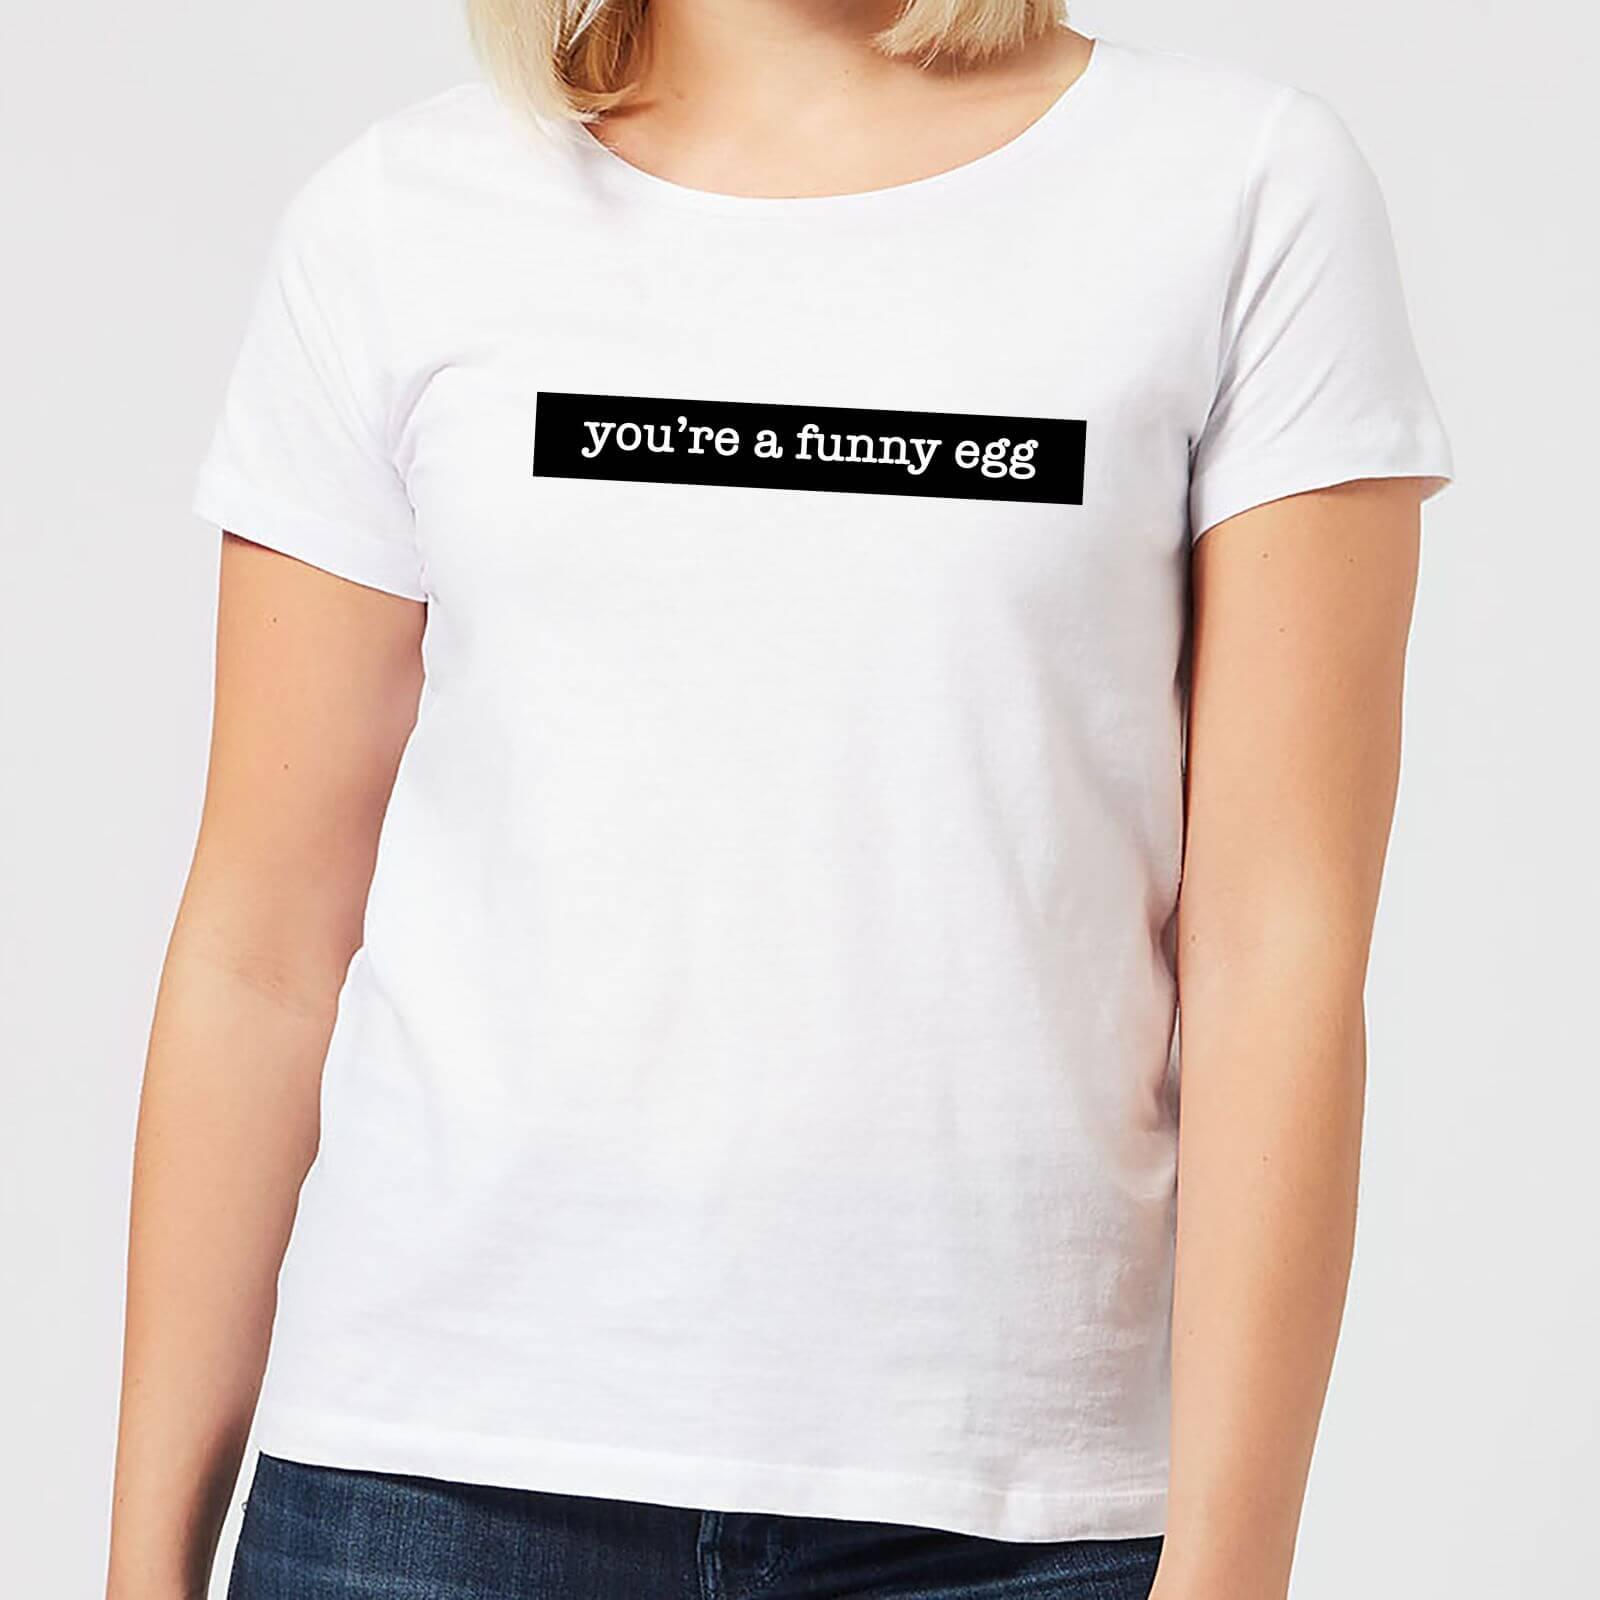 IWOOT You're A Funny Egg Women's T-Shirt - White - XL - White